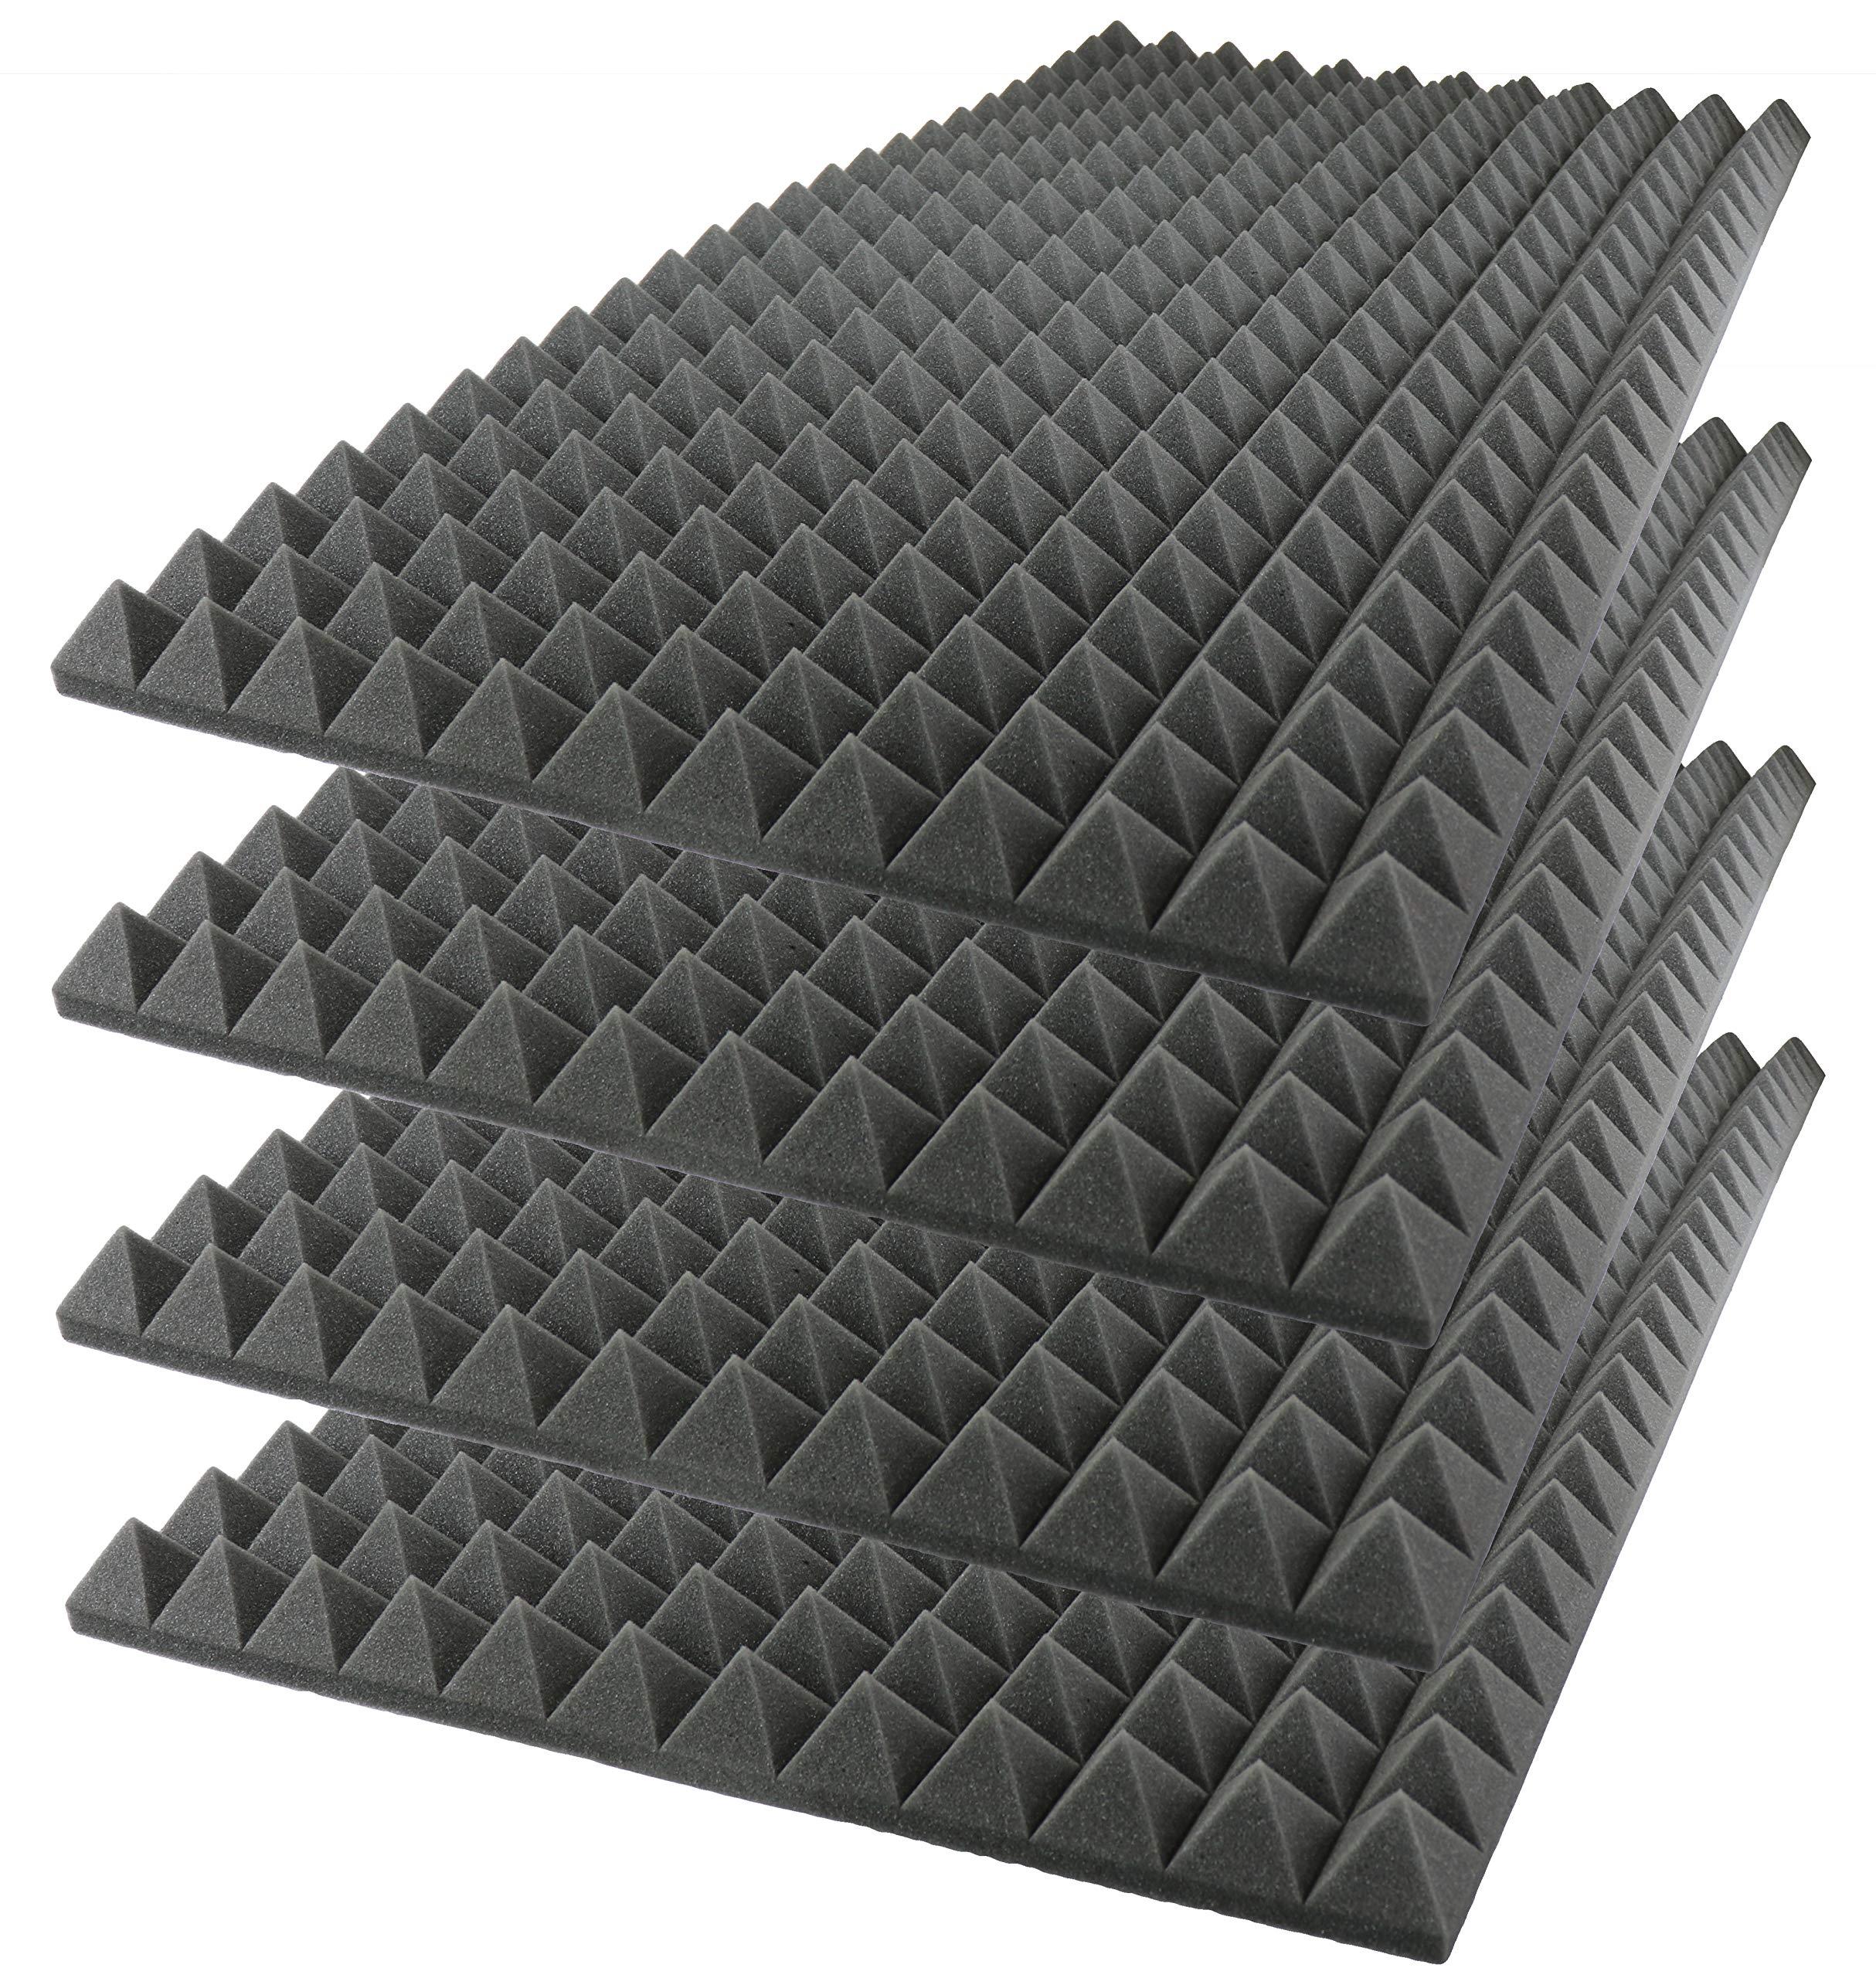 Foamily Acoustic Foam Sound Absorption Pyramid Studio Treatment Wall Panel, 48'' X 24'' X 2'' (4 Pack)